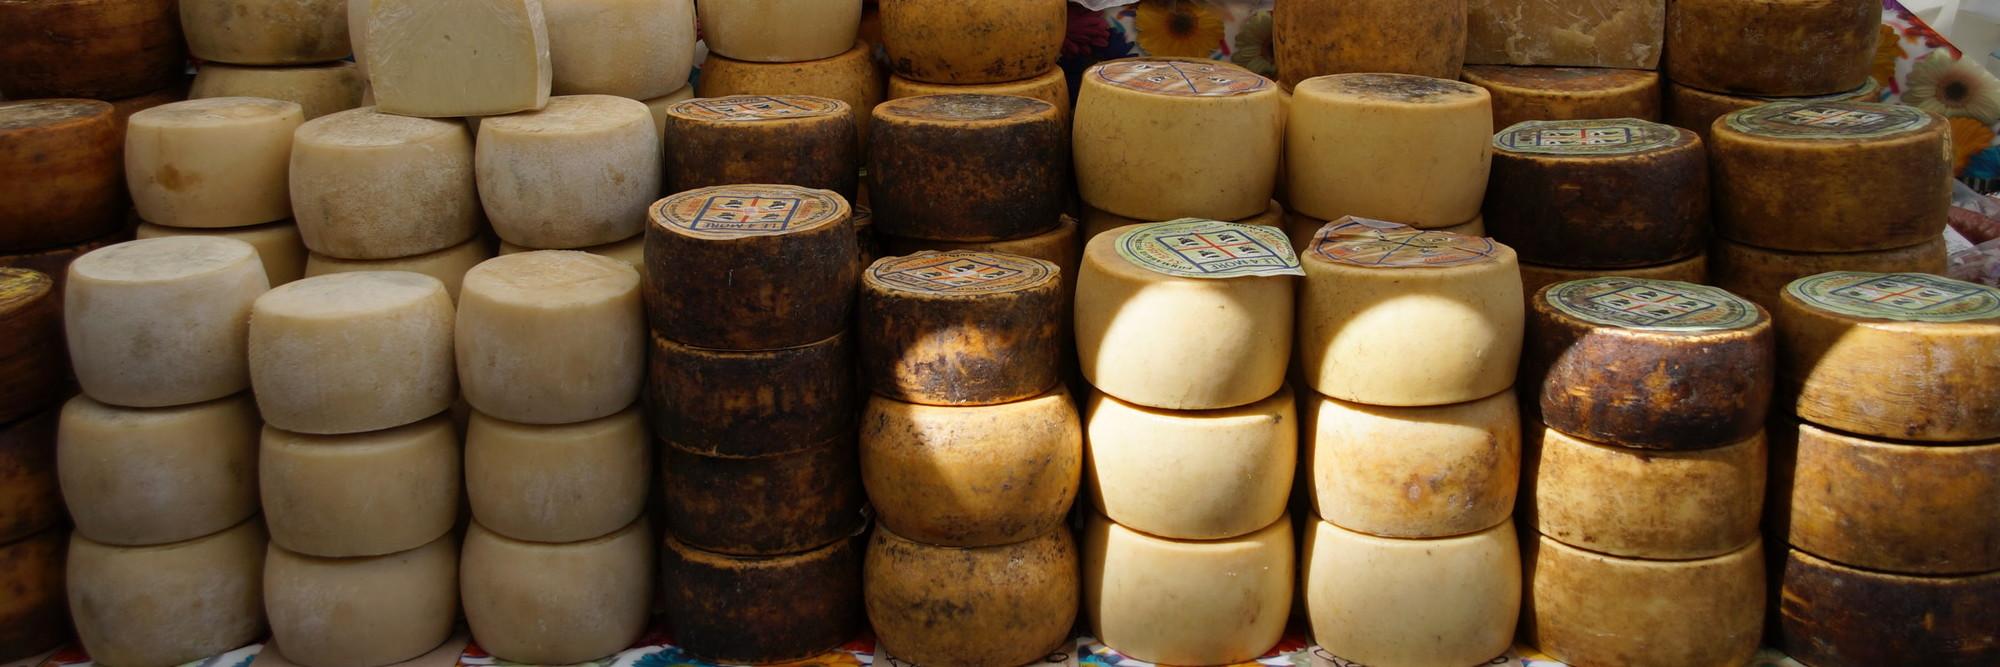 Eine Menge Käselaibe, akkurat gestapelt